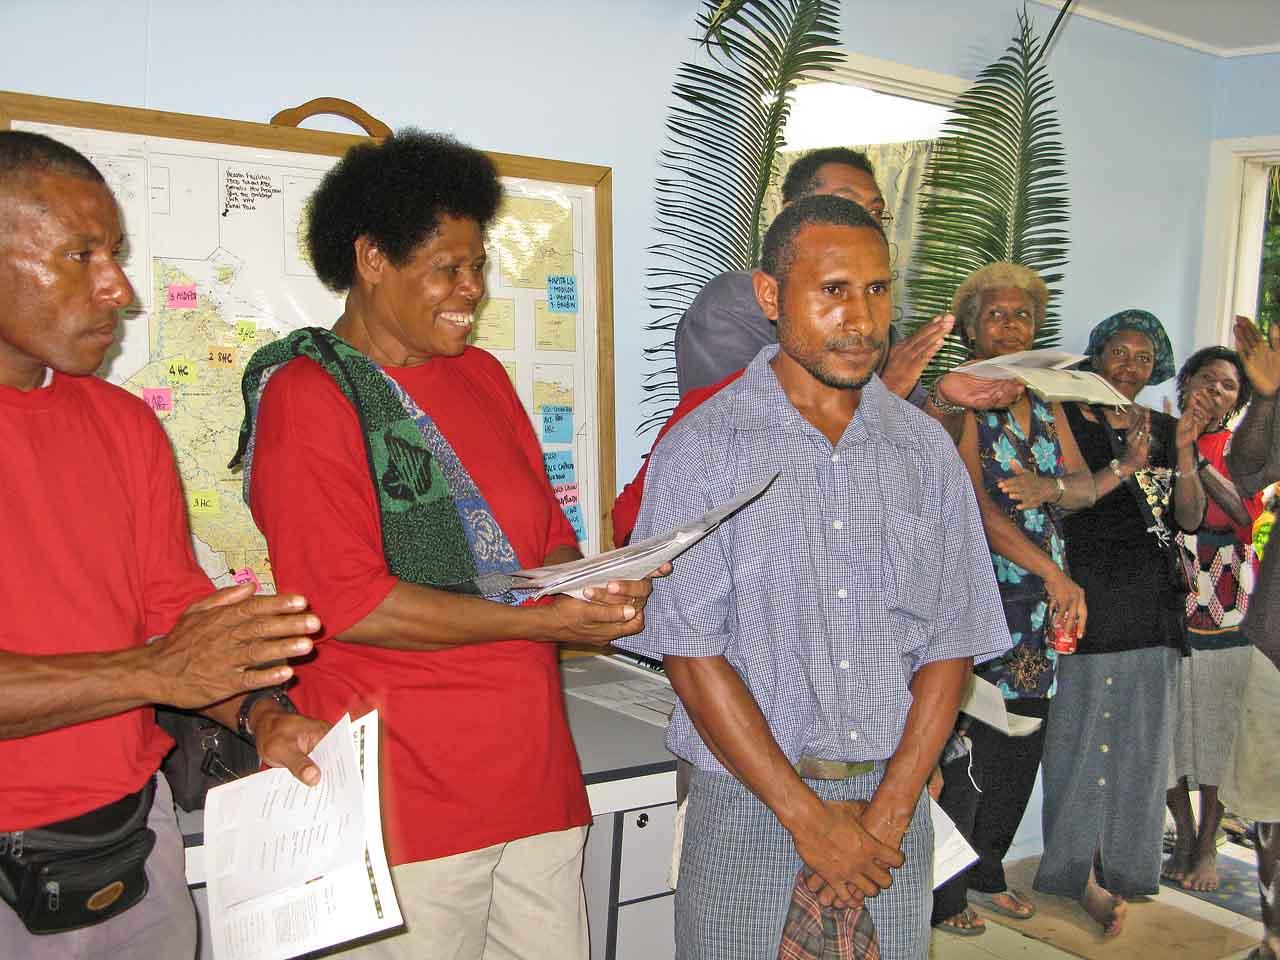 Matricia Mari (HRC) Congratulates Ritchie Garkana, winner of the Art Competition